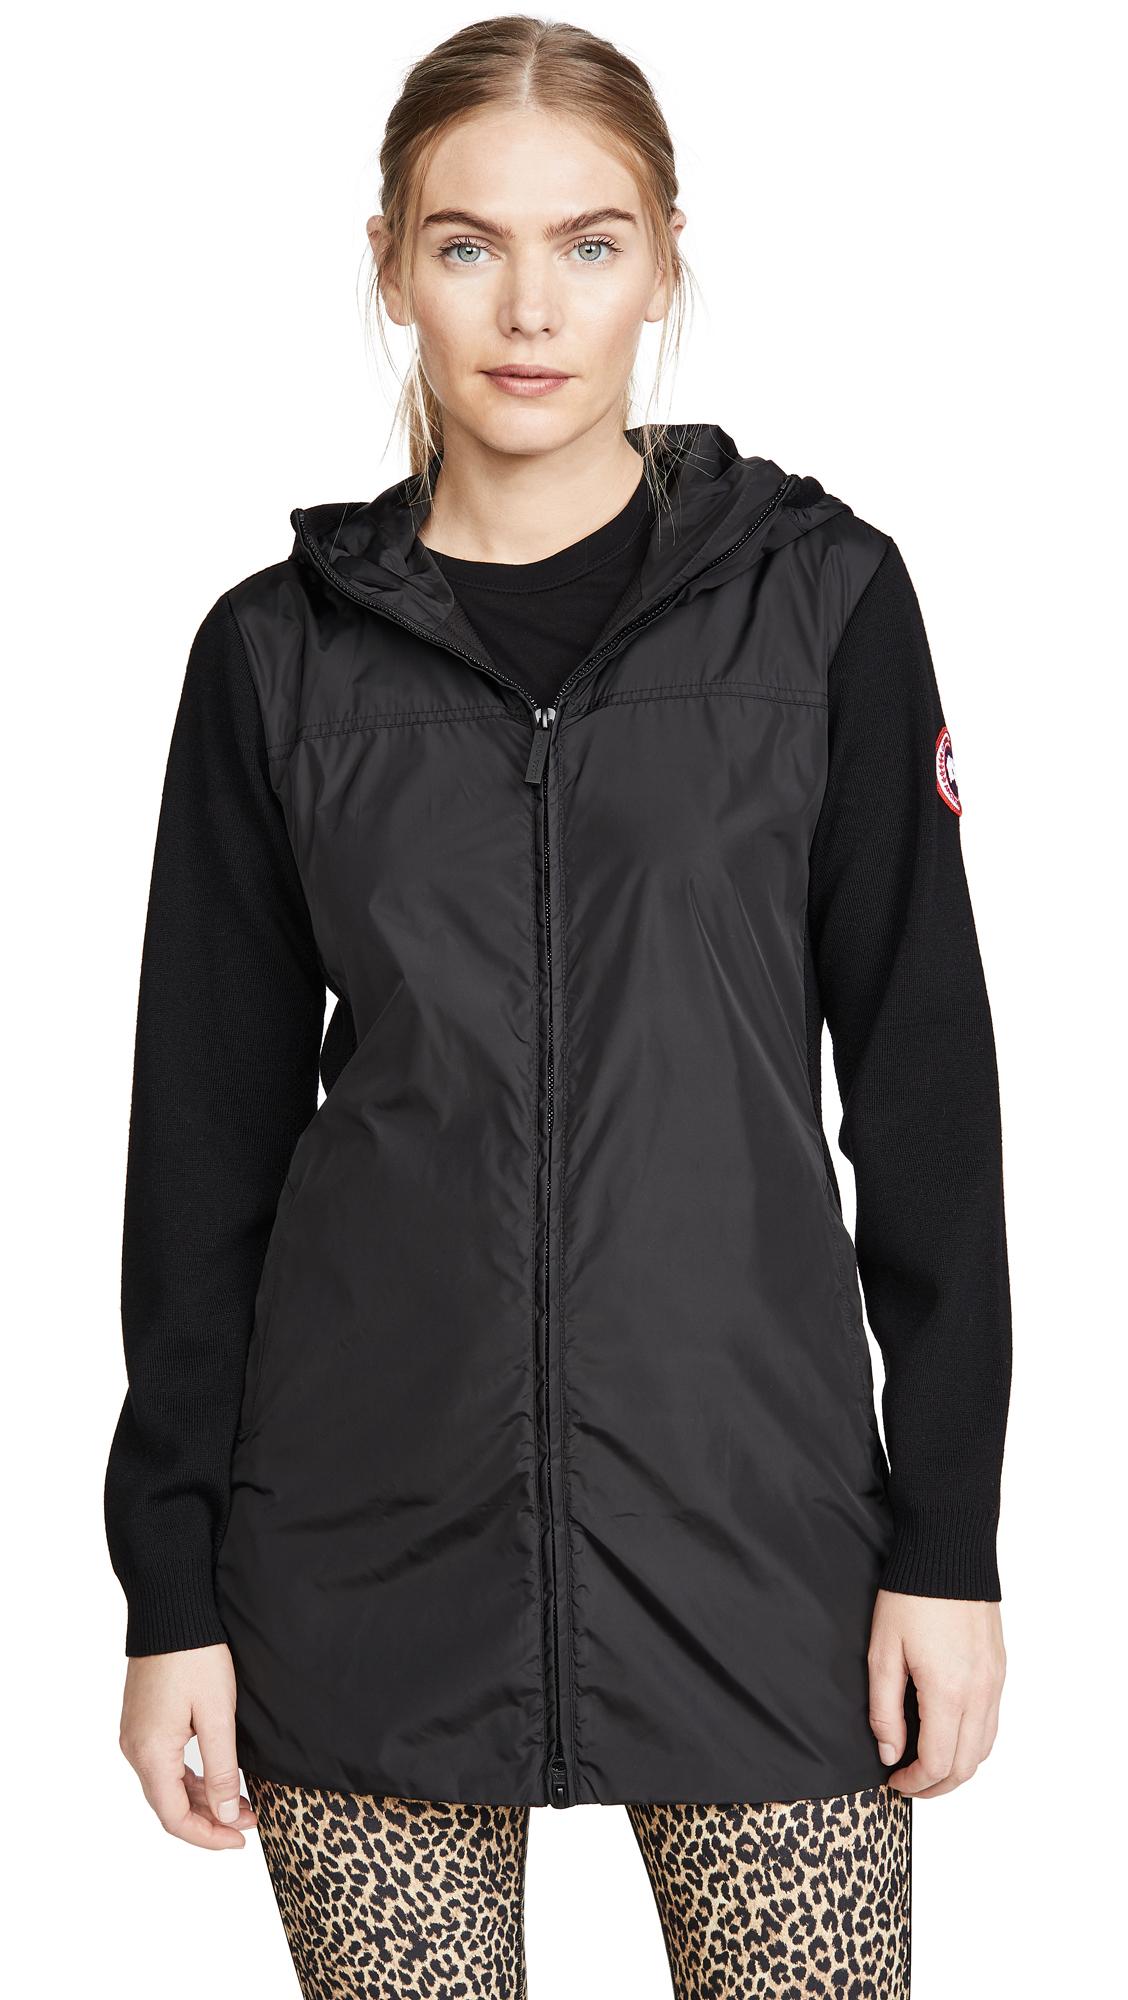 Buy Canada Goose Windbridge Hooded Jacket online beautiful Canada Goose Jackets, Coats, Trench Coats